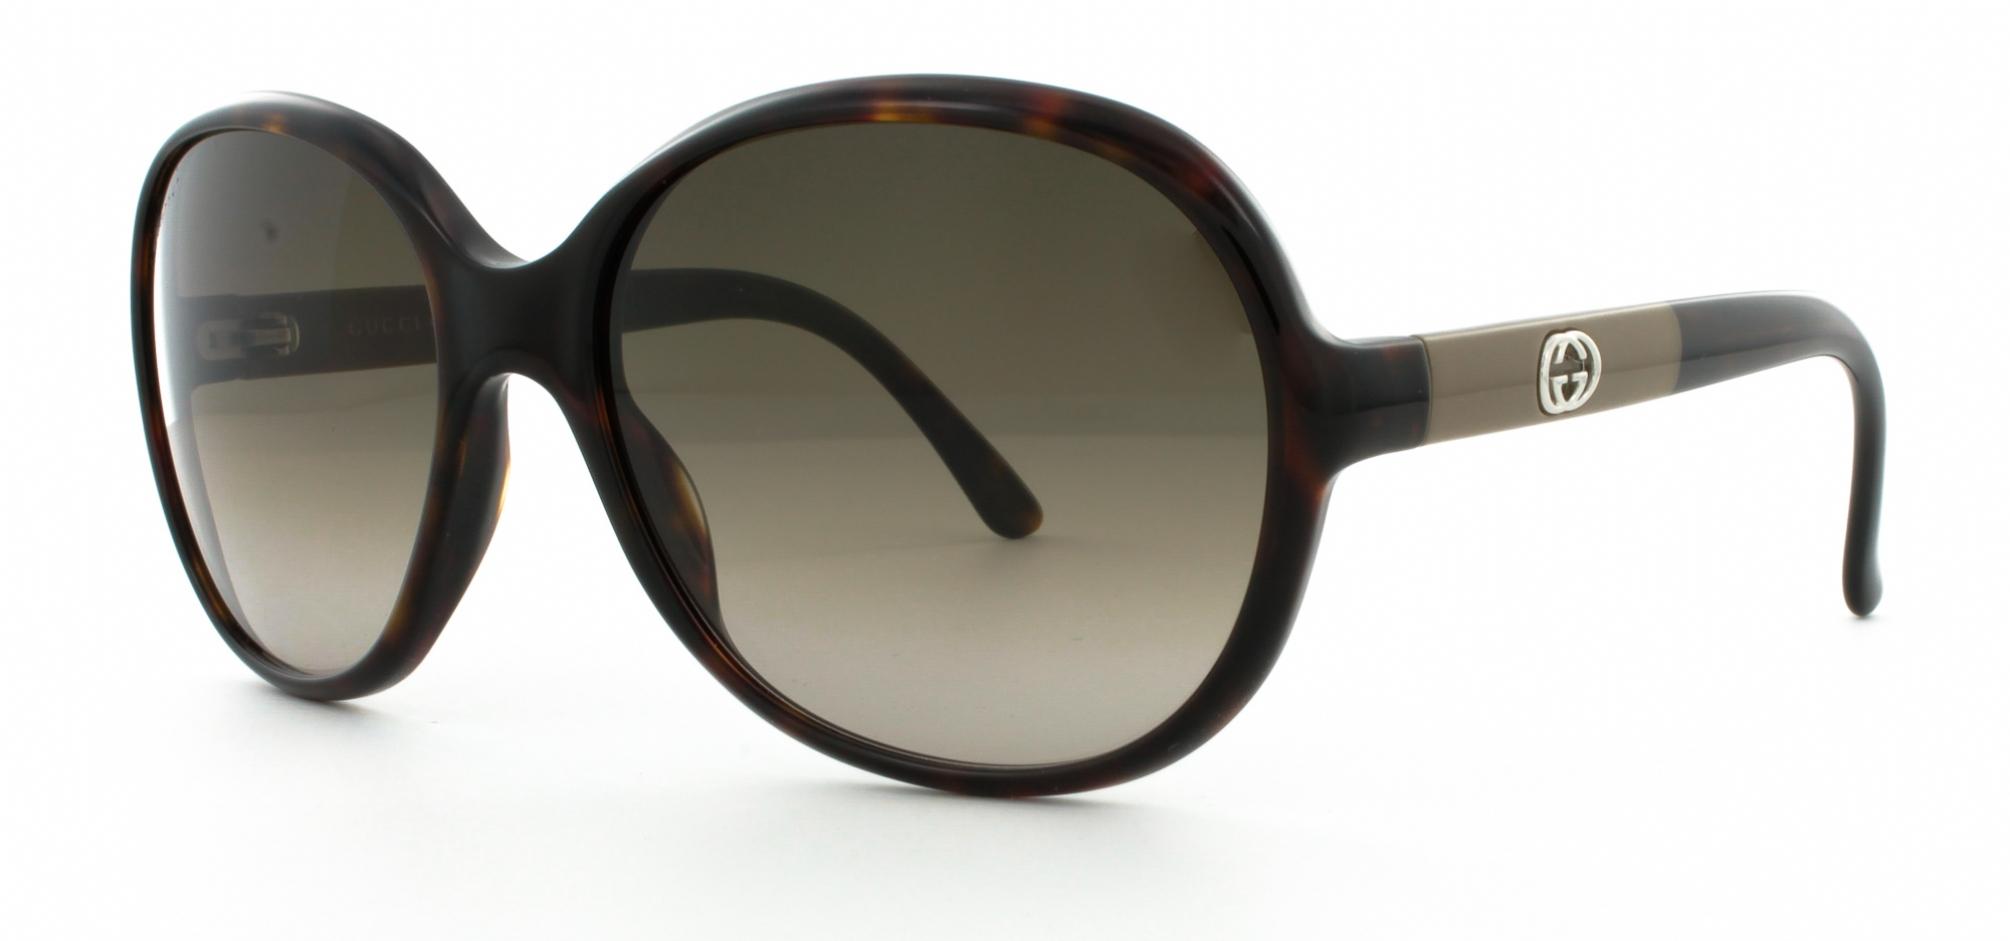 33ac1300c580c Buy Gucci Sunglasses directly from OpticsFast.com